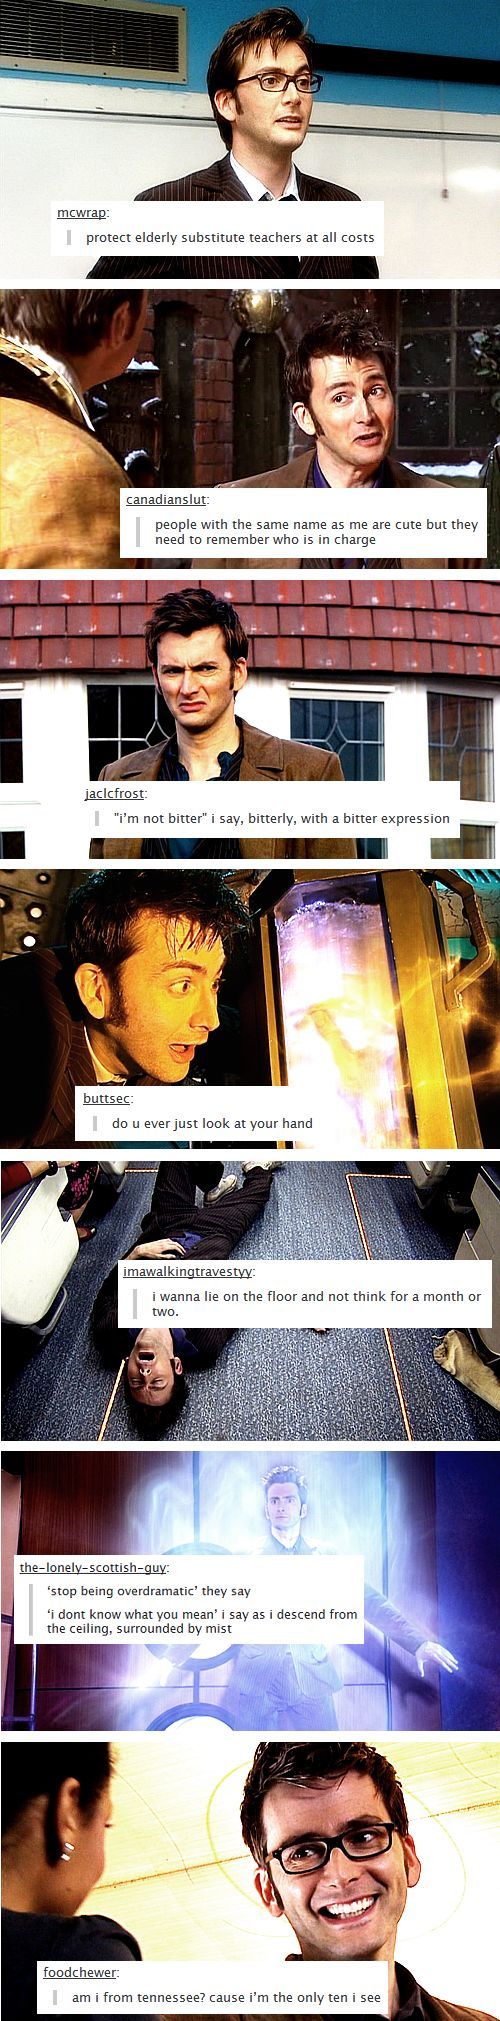 Textpost Edits: Tenth Doctor edition